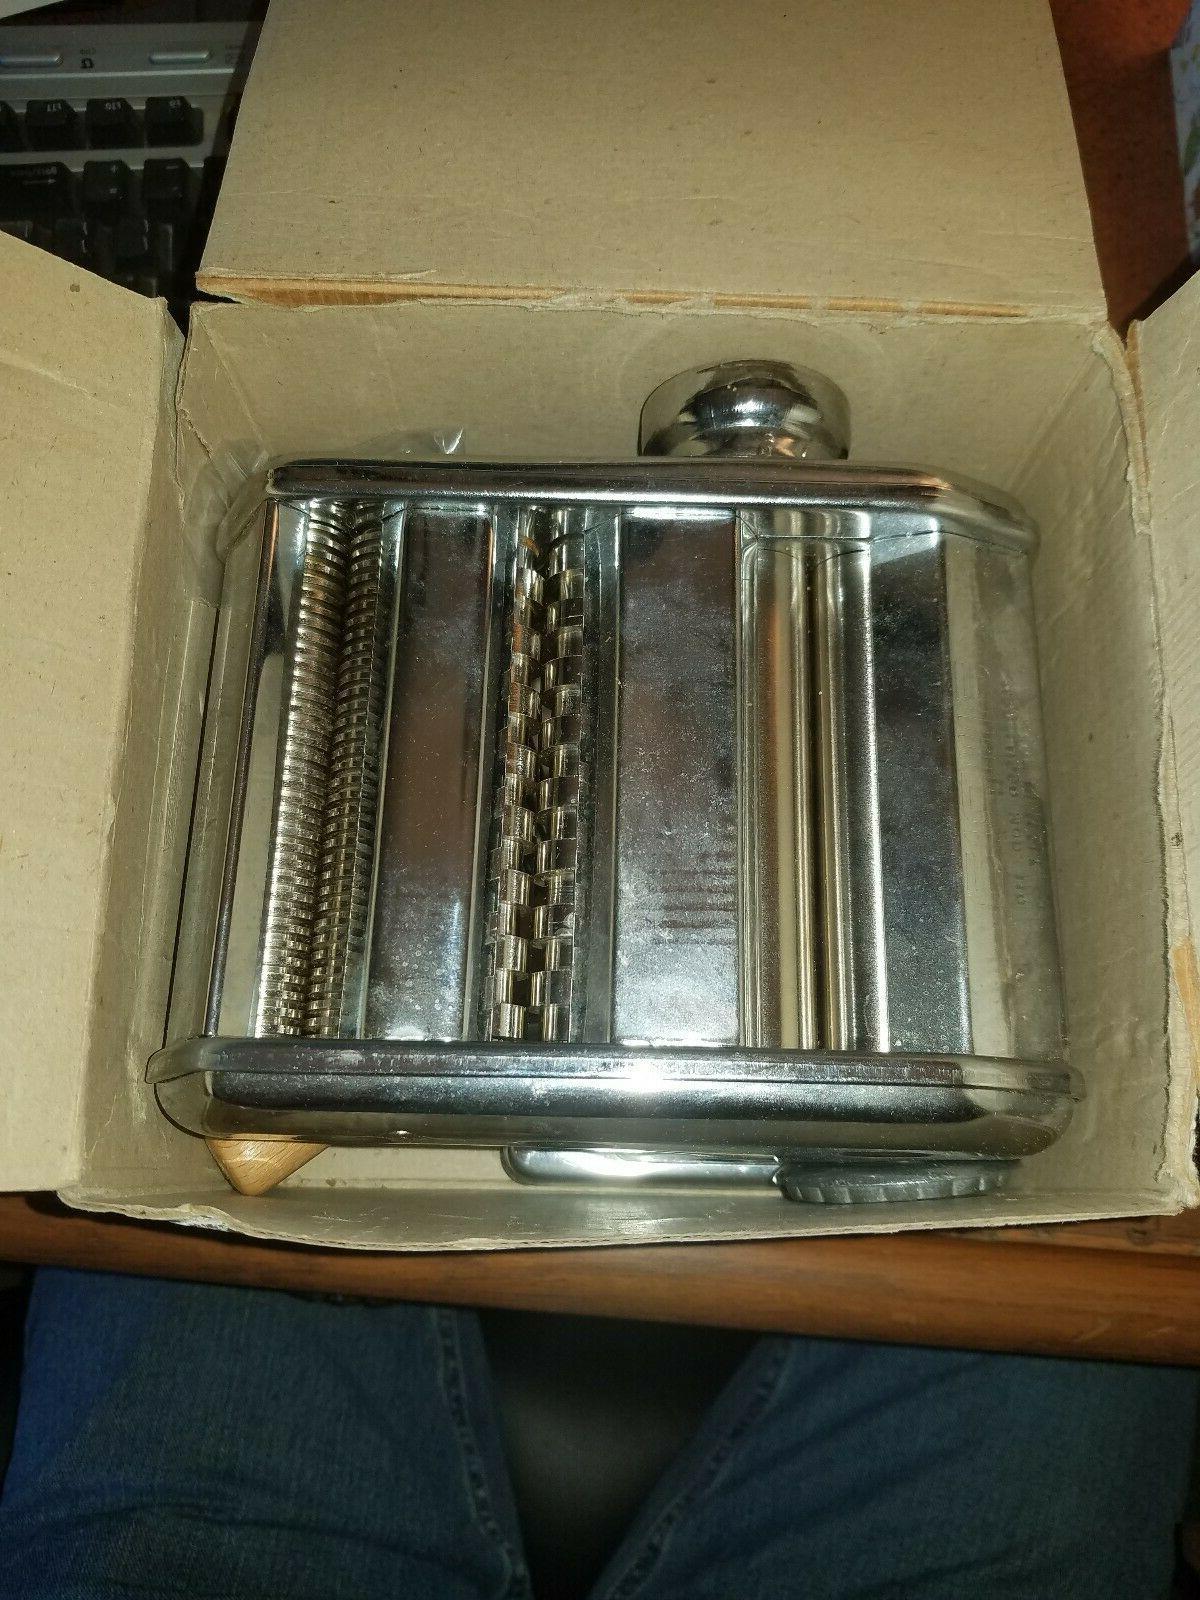 homestart hst5018 pasta maker makers small kitchen